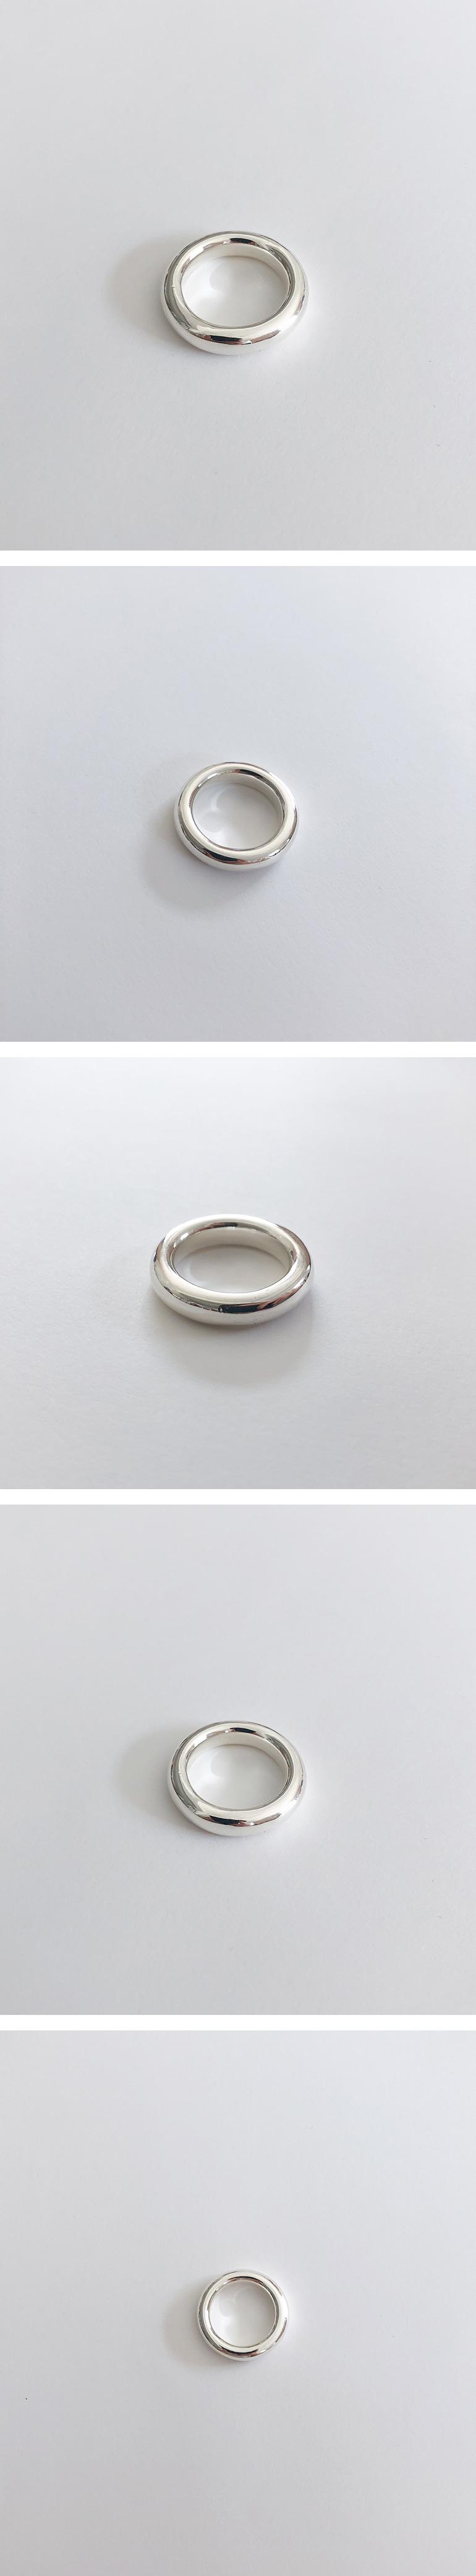 (silver925) heavy ring